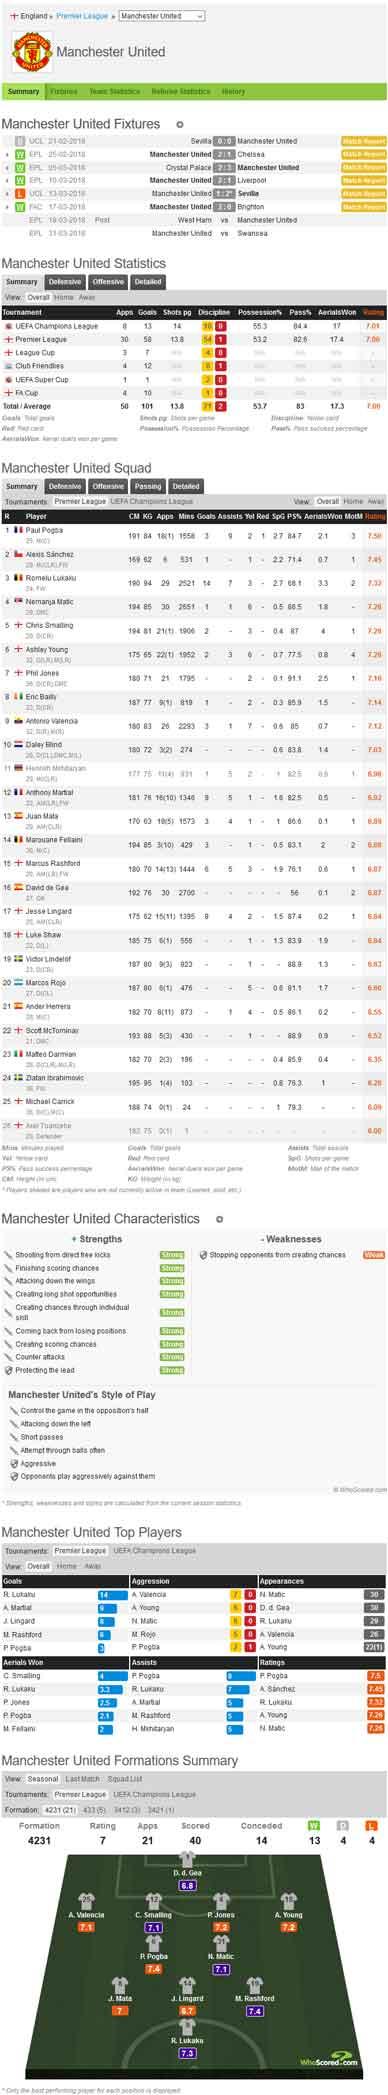 Data statistik pasaran taruhan bola manchester united